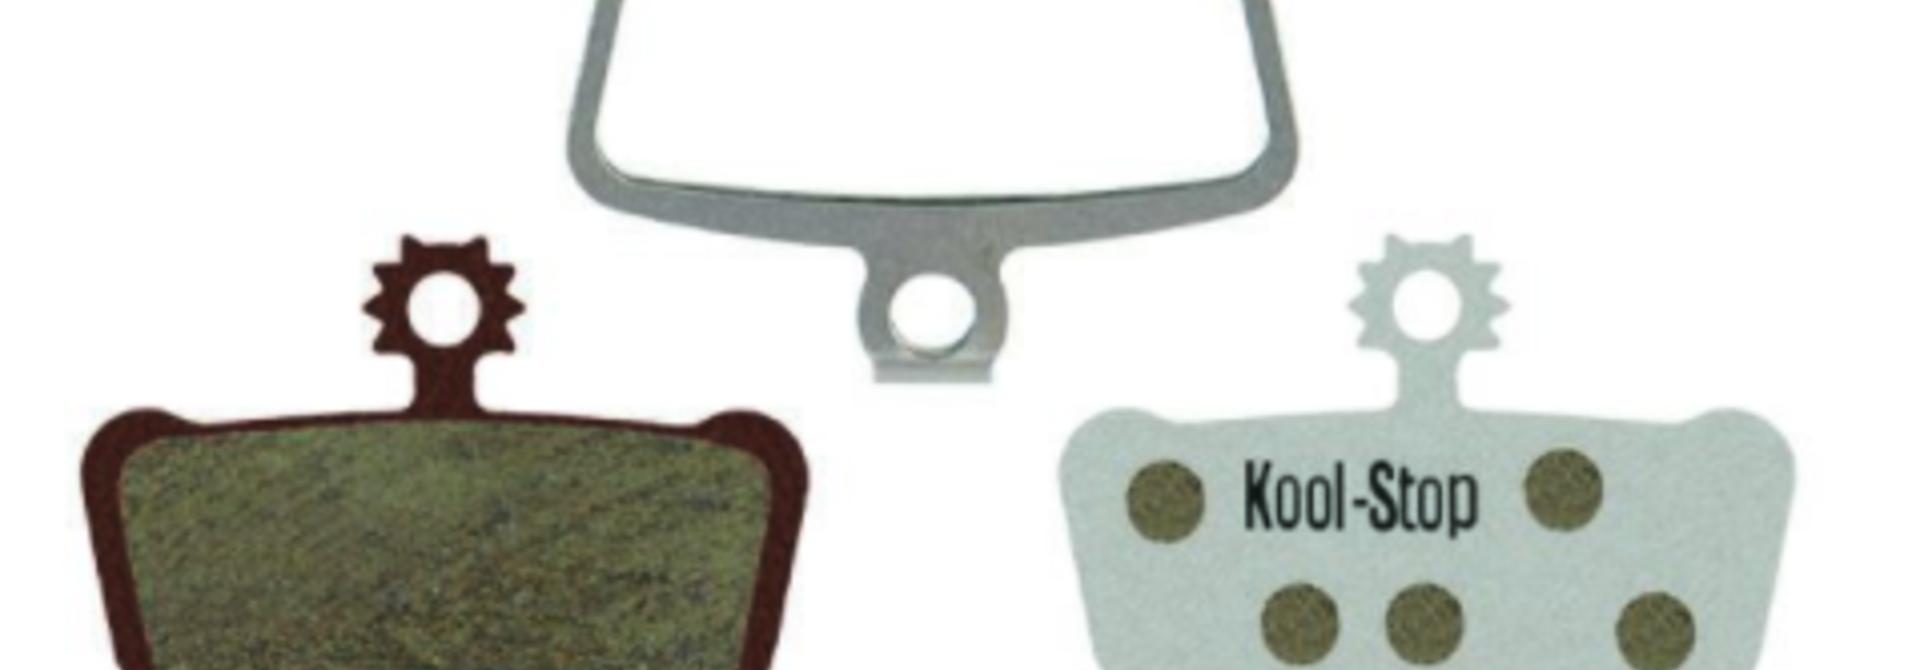 Kool-Stop XO/Elixir/Guide Disc Brake Pads, Aluminum Plate